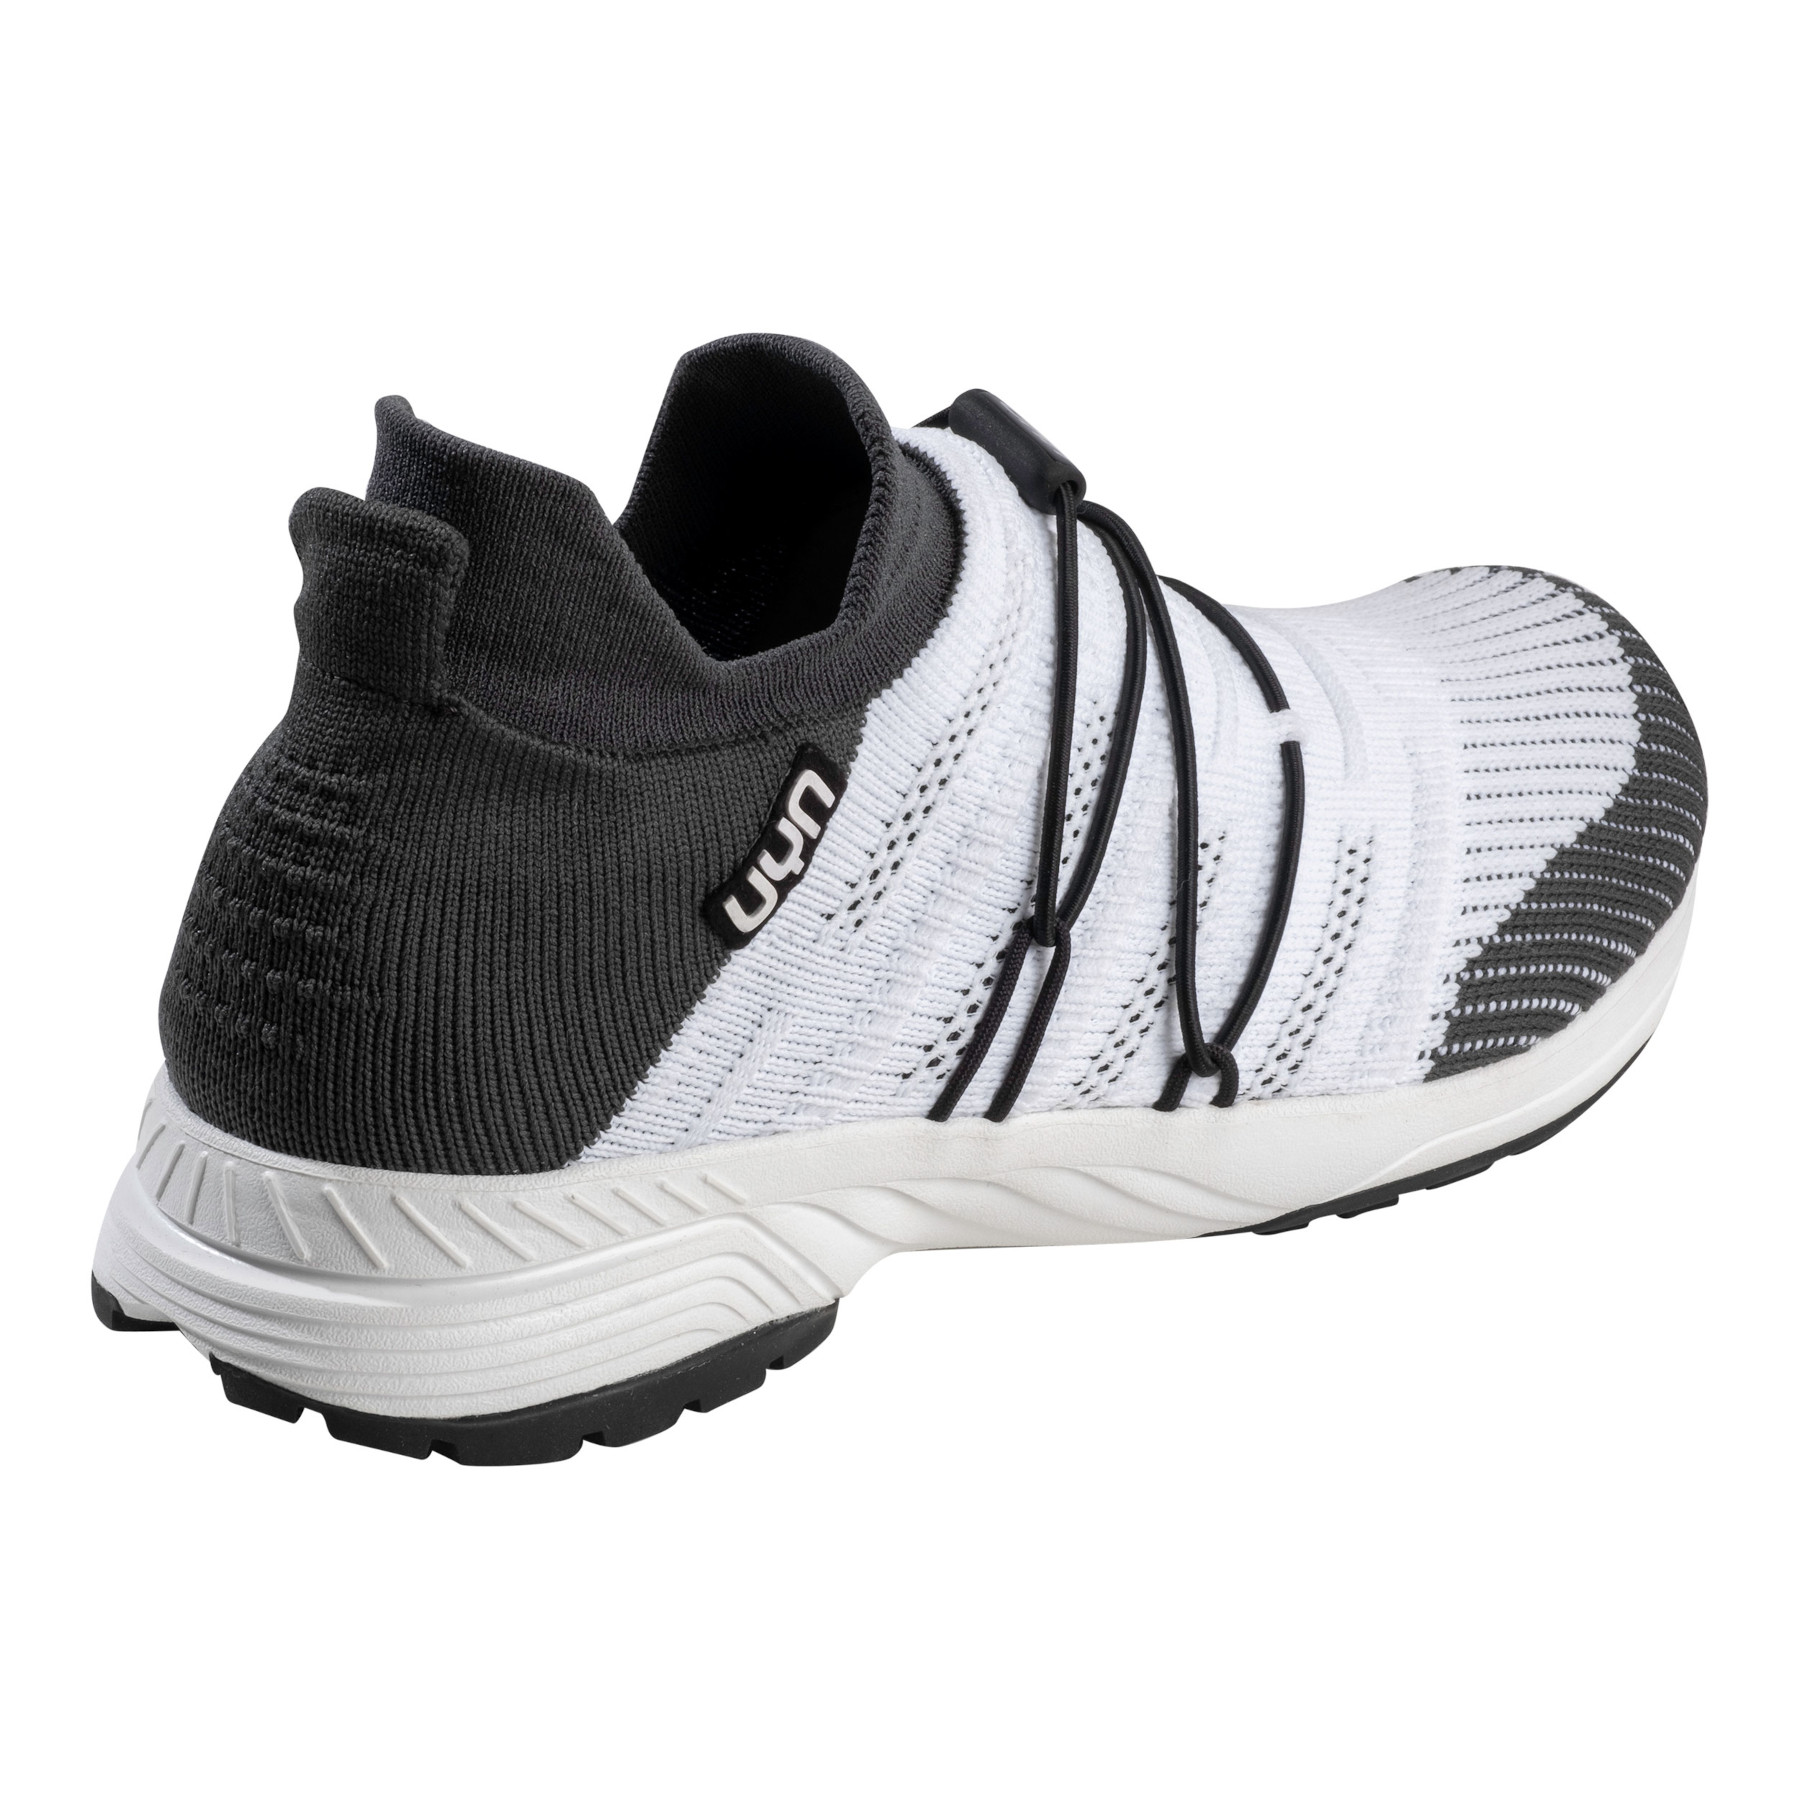 Image of UYN Free Flow Tune Running Shoes Women - White/Grey